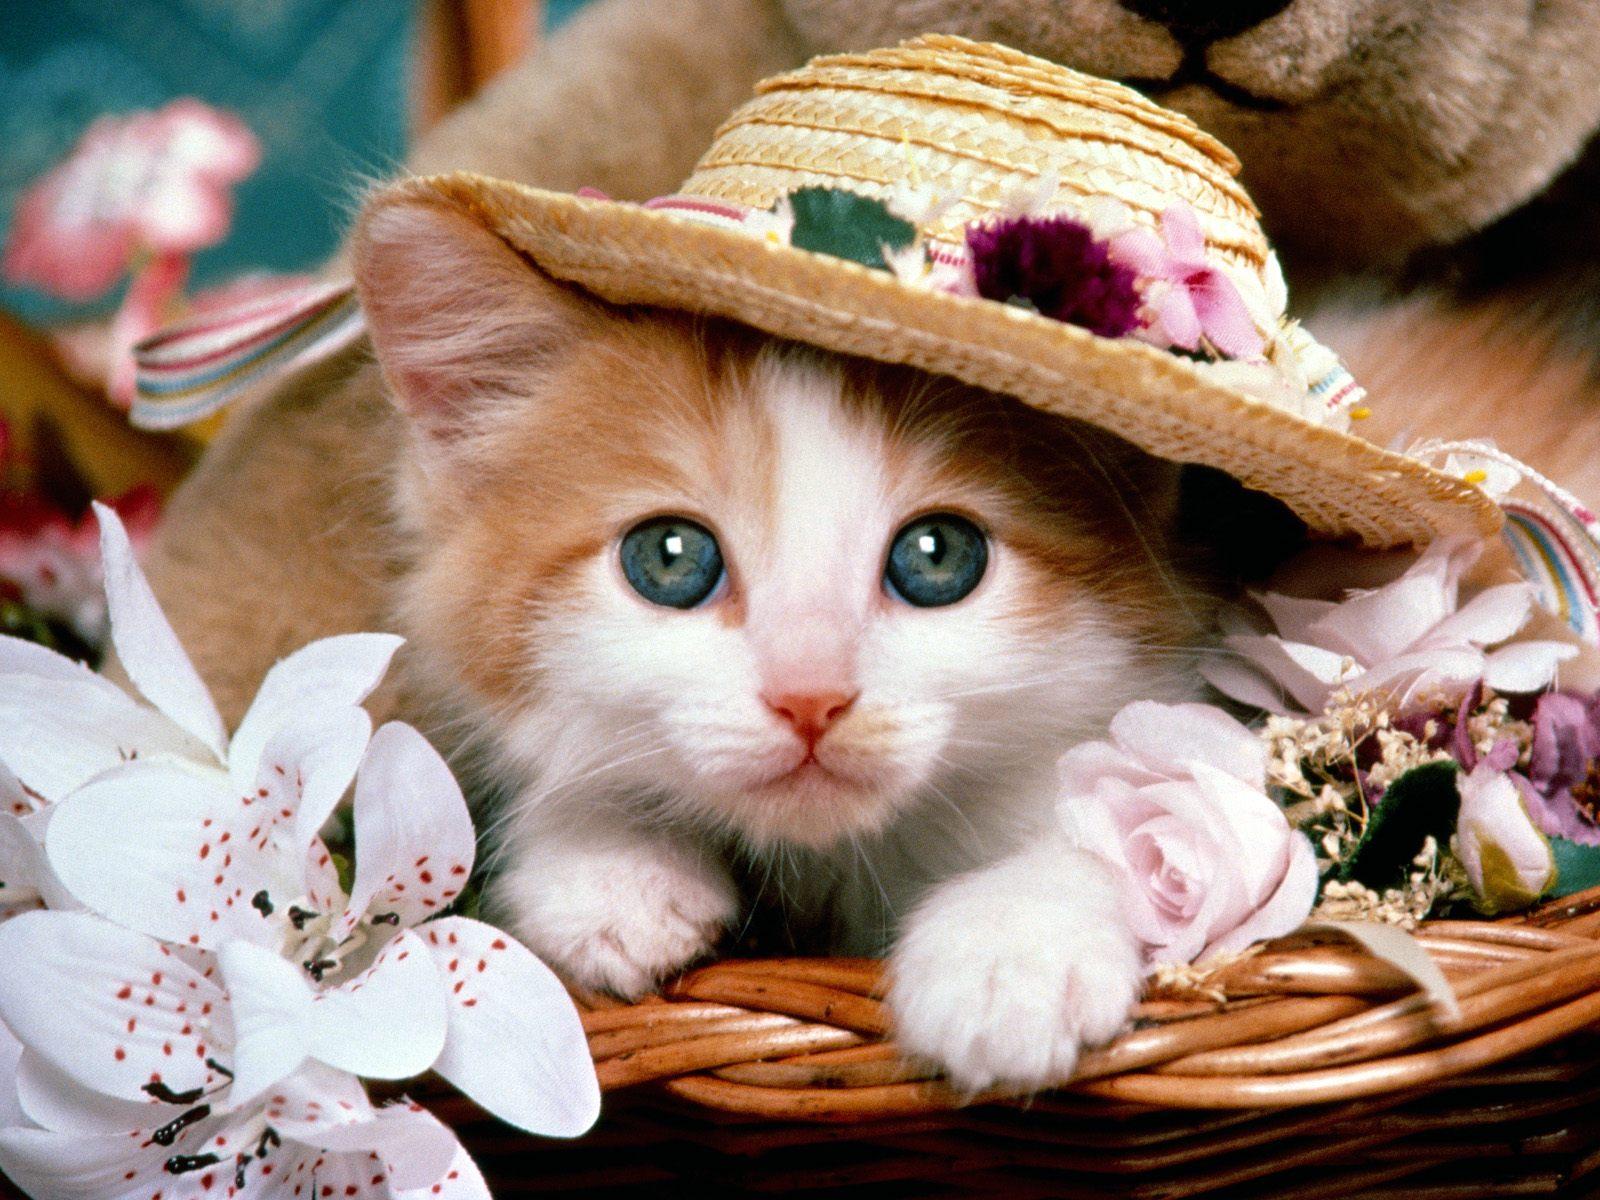 http://1.bp.blogspot.com/-v7RxQyOWA7g/T8cGOc6rrCI/AAAAAAAAA0o/sFXj72_dcCA/s1600/Cat-with-Hat.jpg